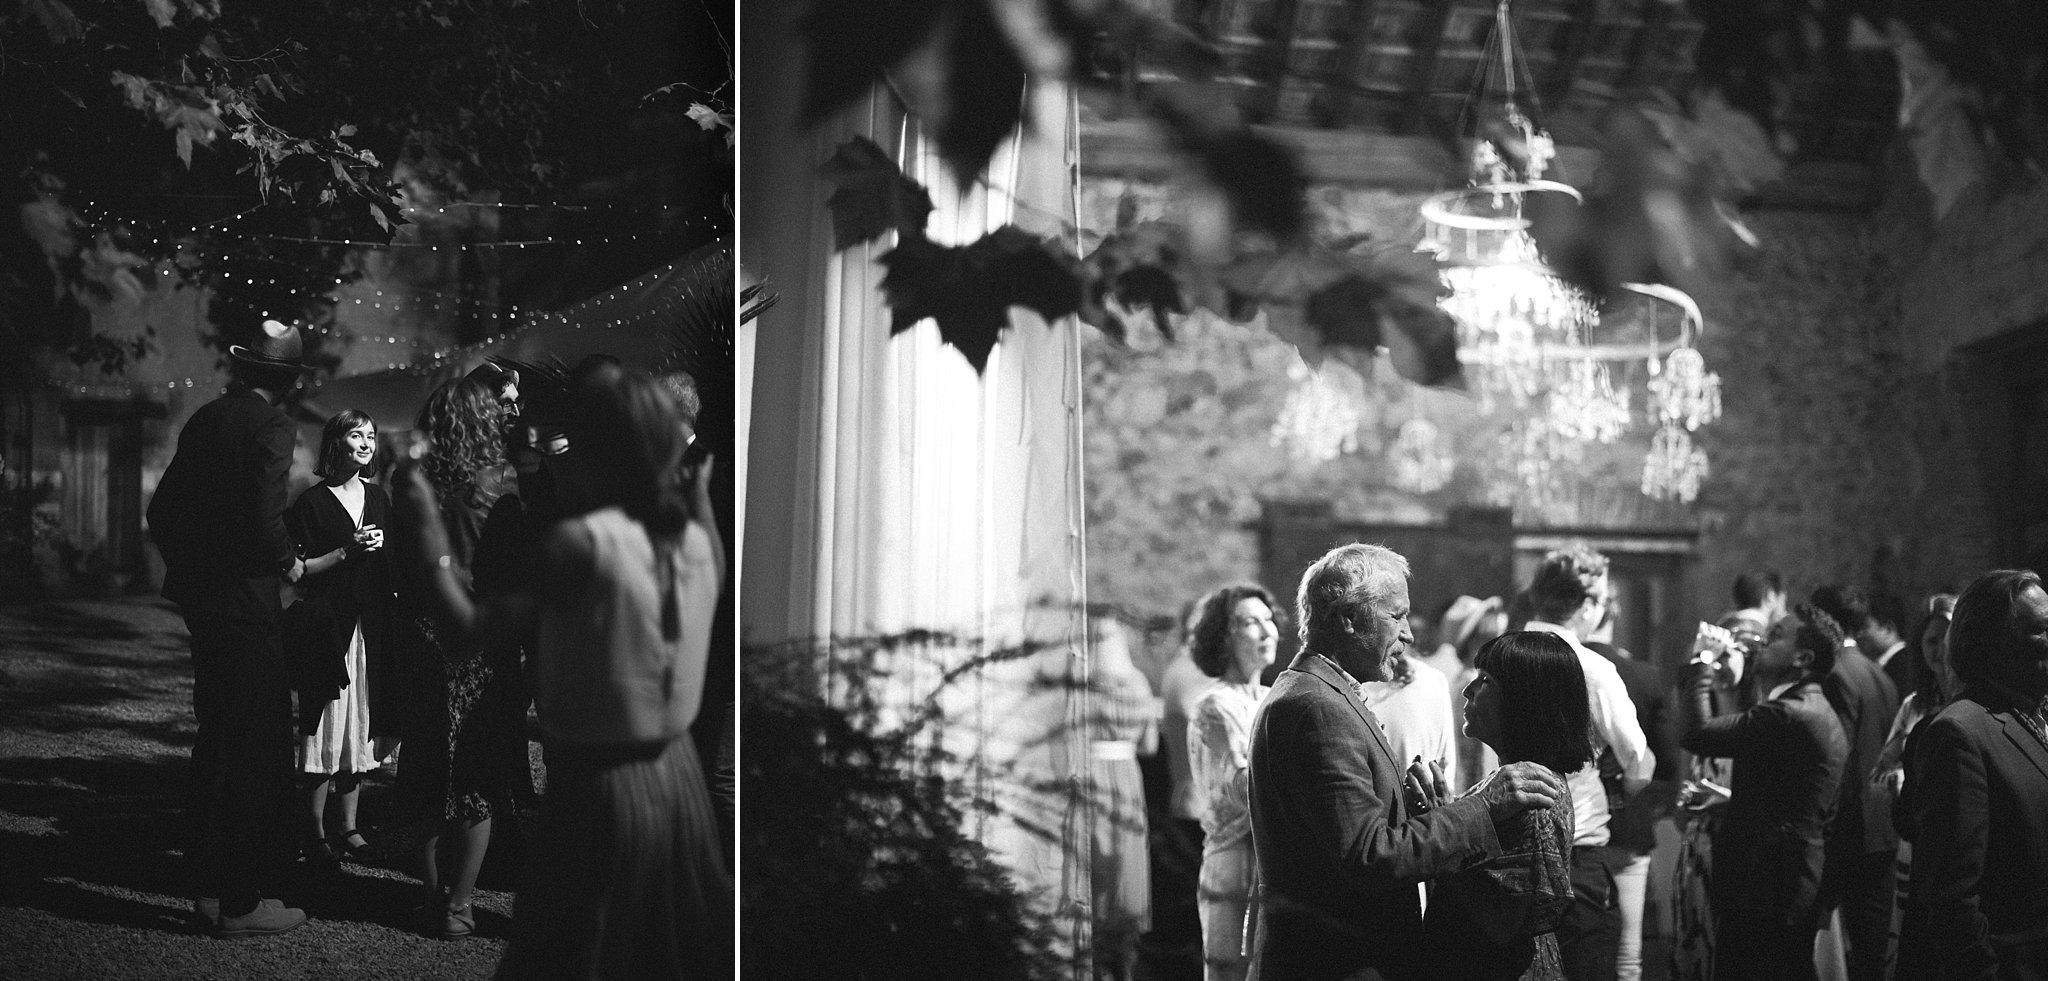 Wedding Photographer Perpignan - Château Las Collas Wedding - Hugo Hennequin110.jpg